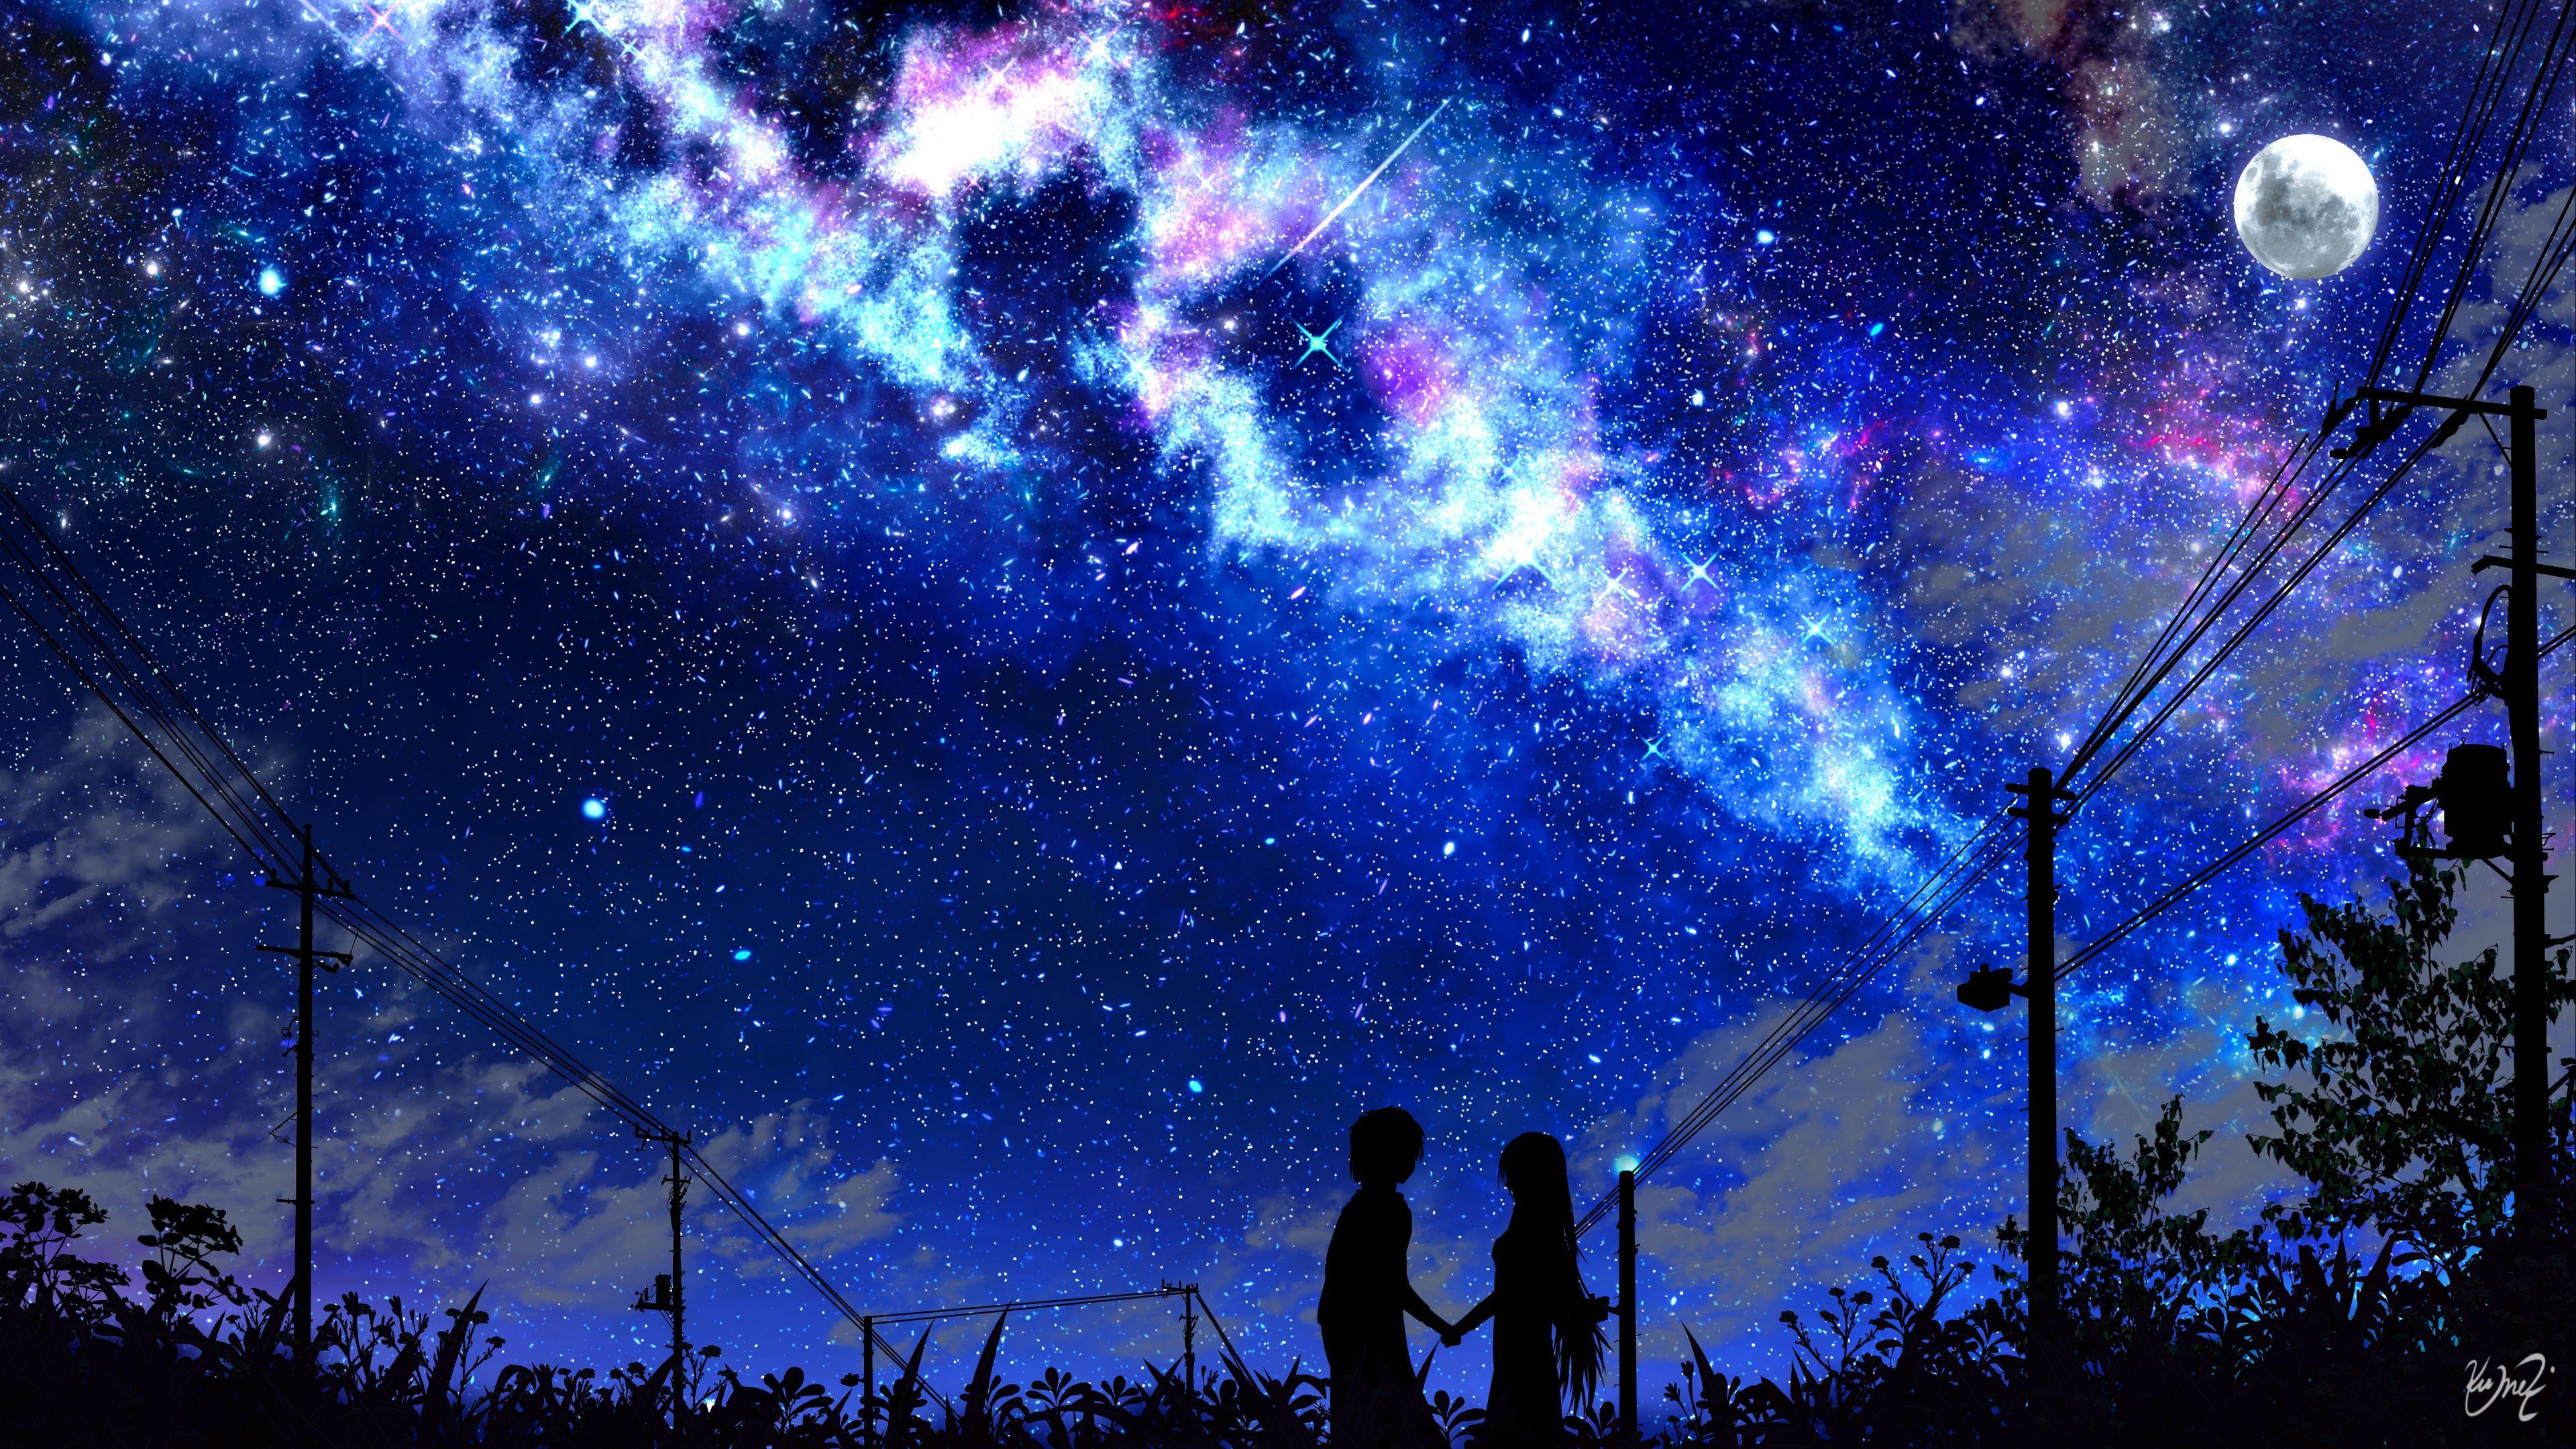 Download wallpaper 3840x2160 silhouette, night, starry sky